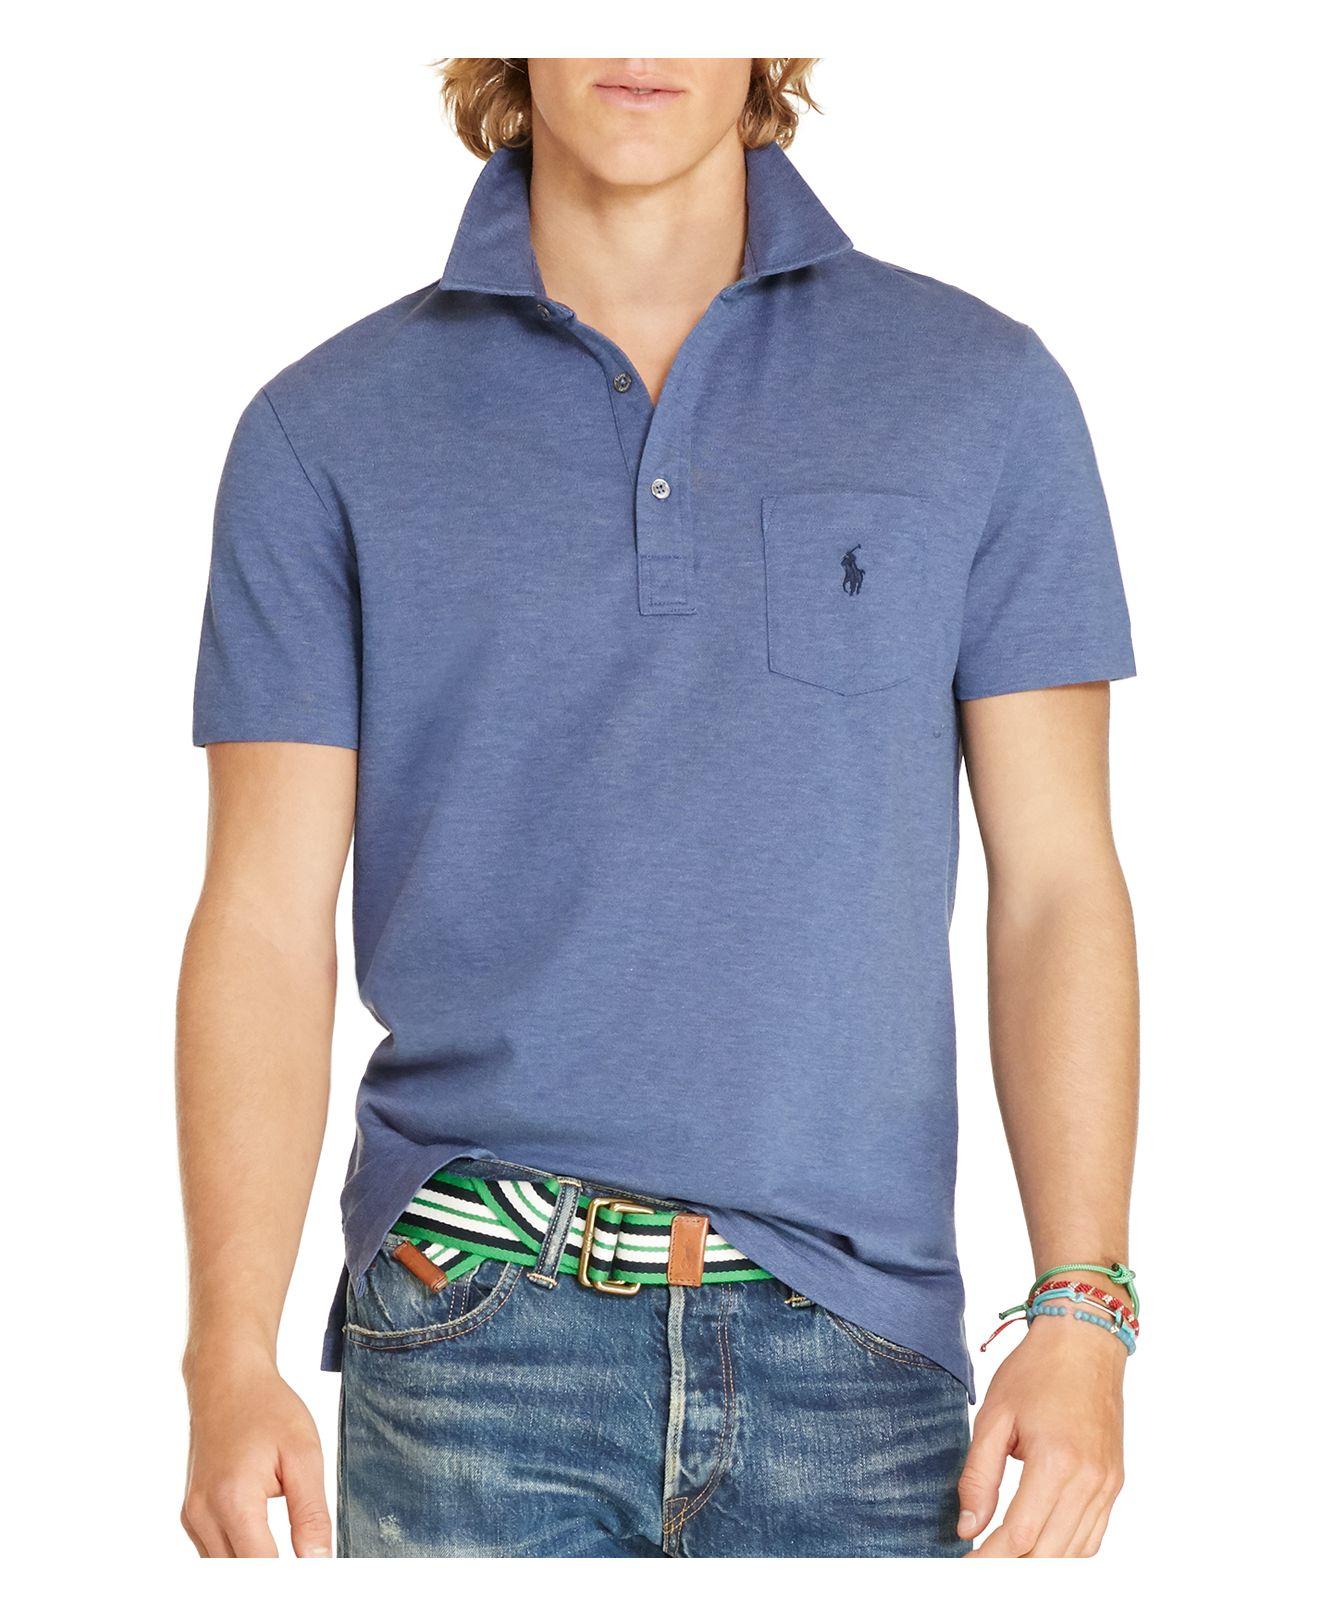 Polo ralph lauren stretch cotton mesh slim fit polo shirt for Stretch polo shirt mens